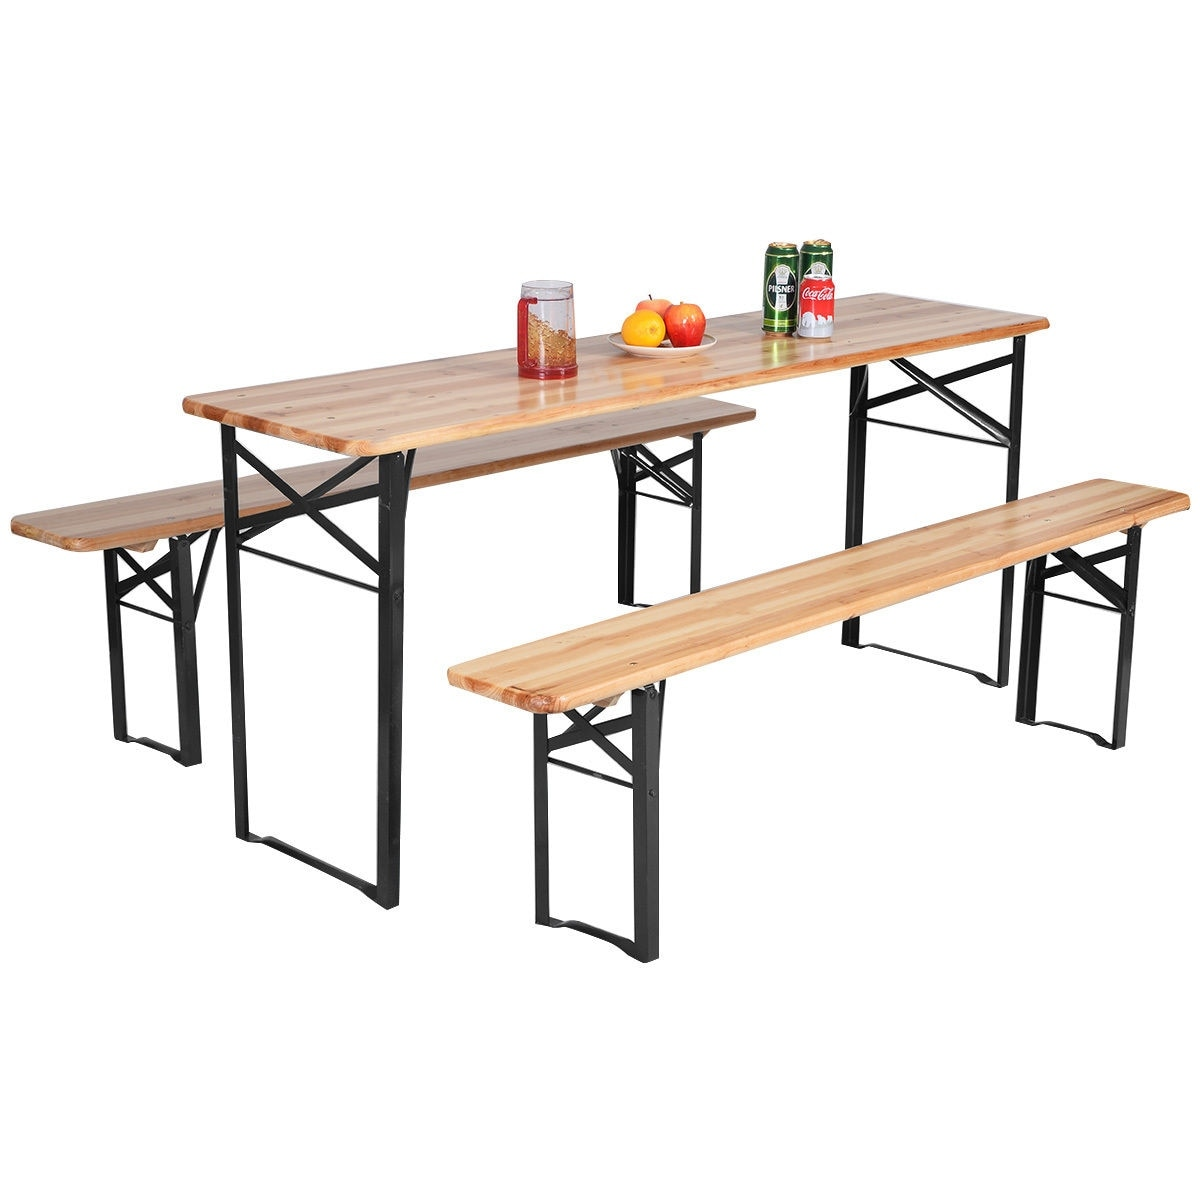 - Shop Costway 3 PCS Beer Table Bench Set Folding Wooden Top Picnic